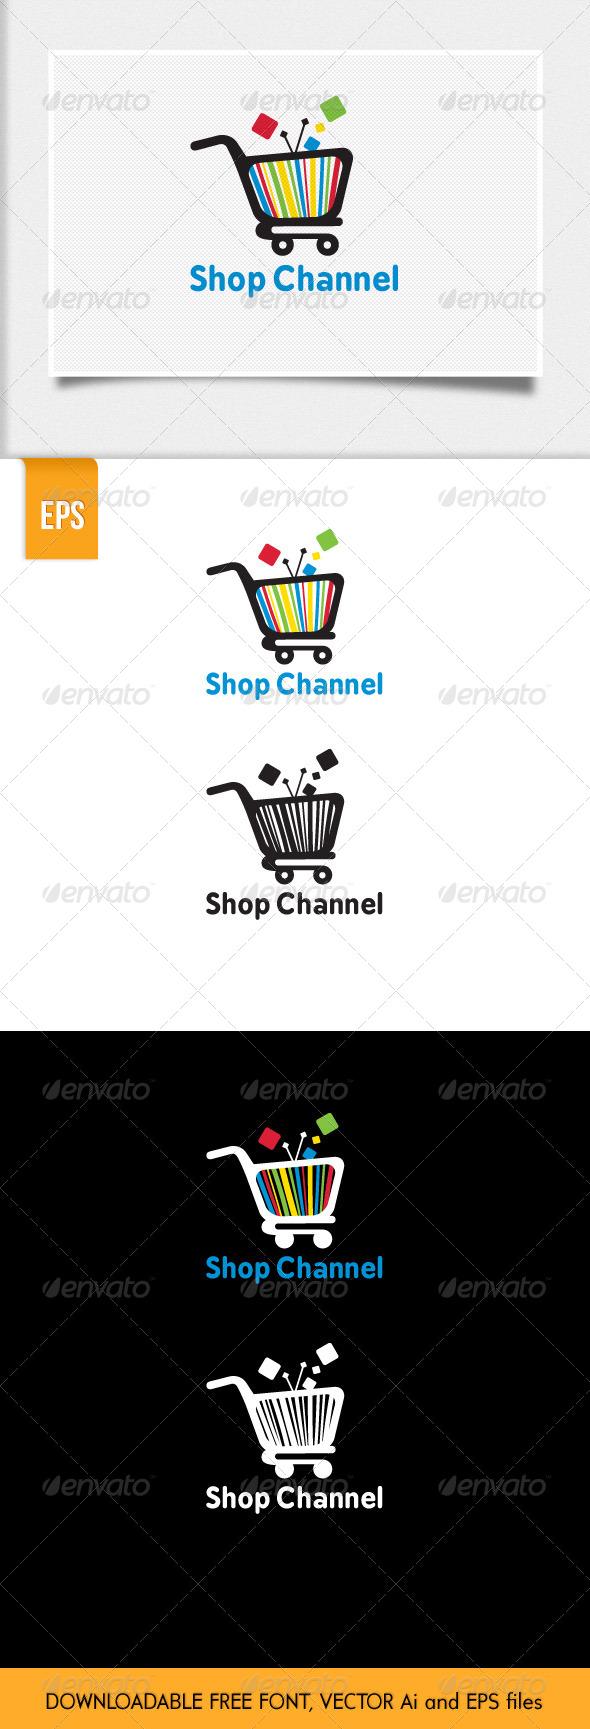 Shop Channel Logo Template